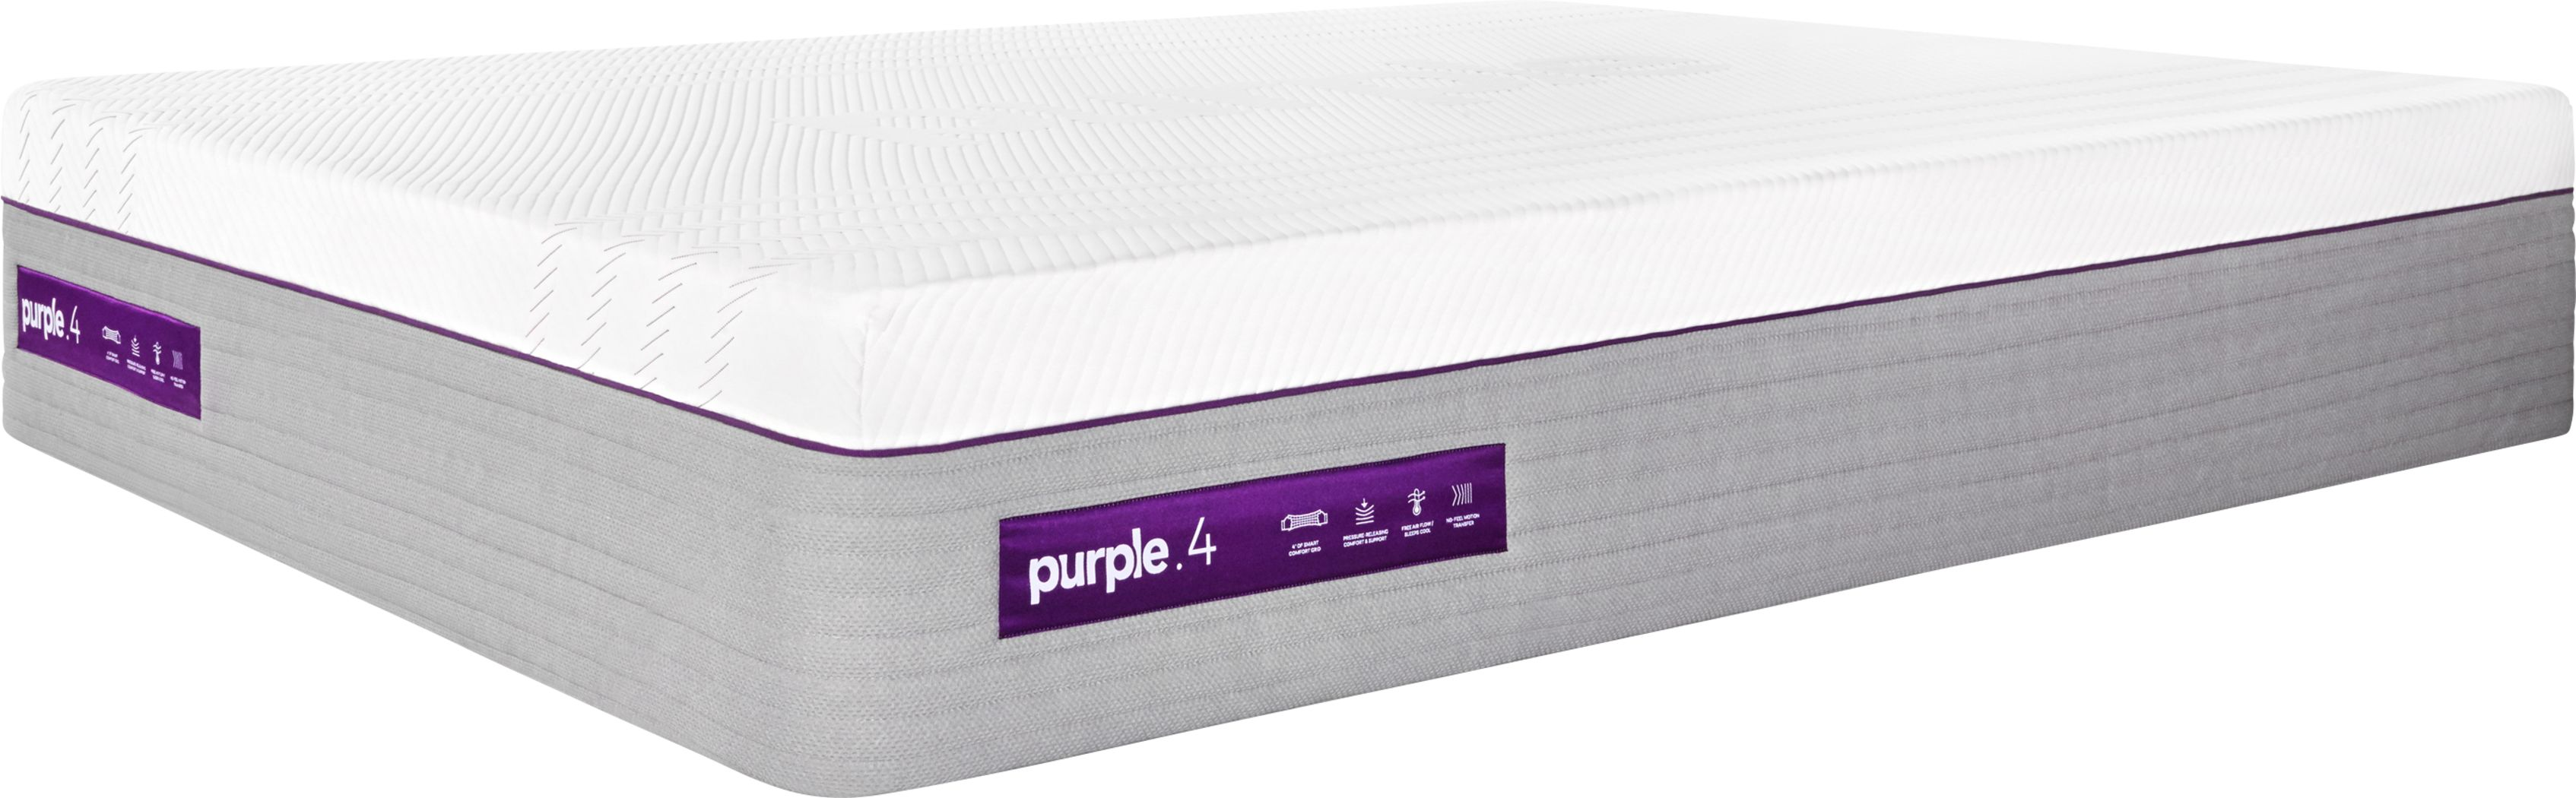 Purple Hybrid Premier 4 Twin XL Mattress